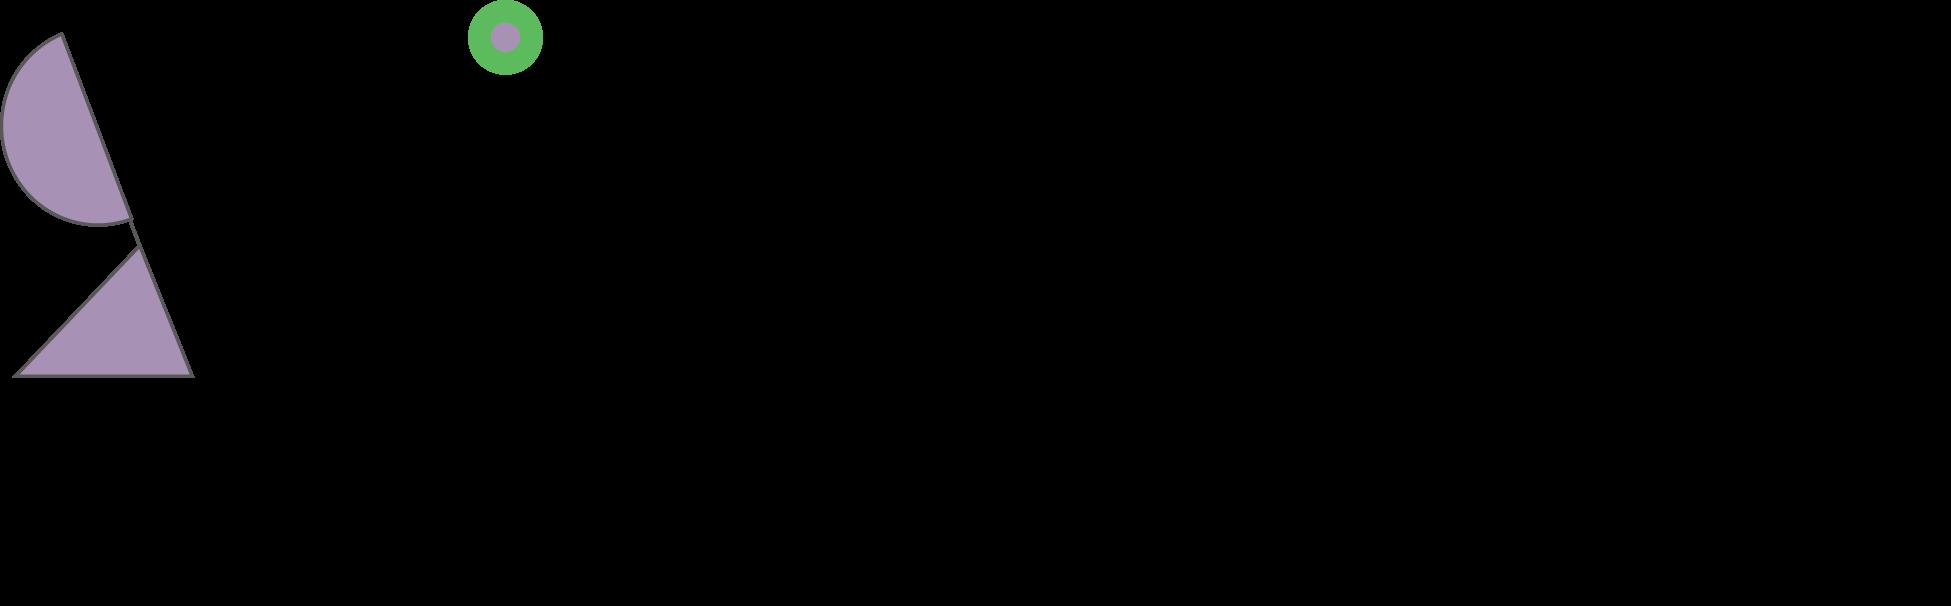 Big Catapult logo - complete.png